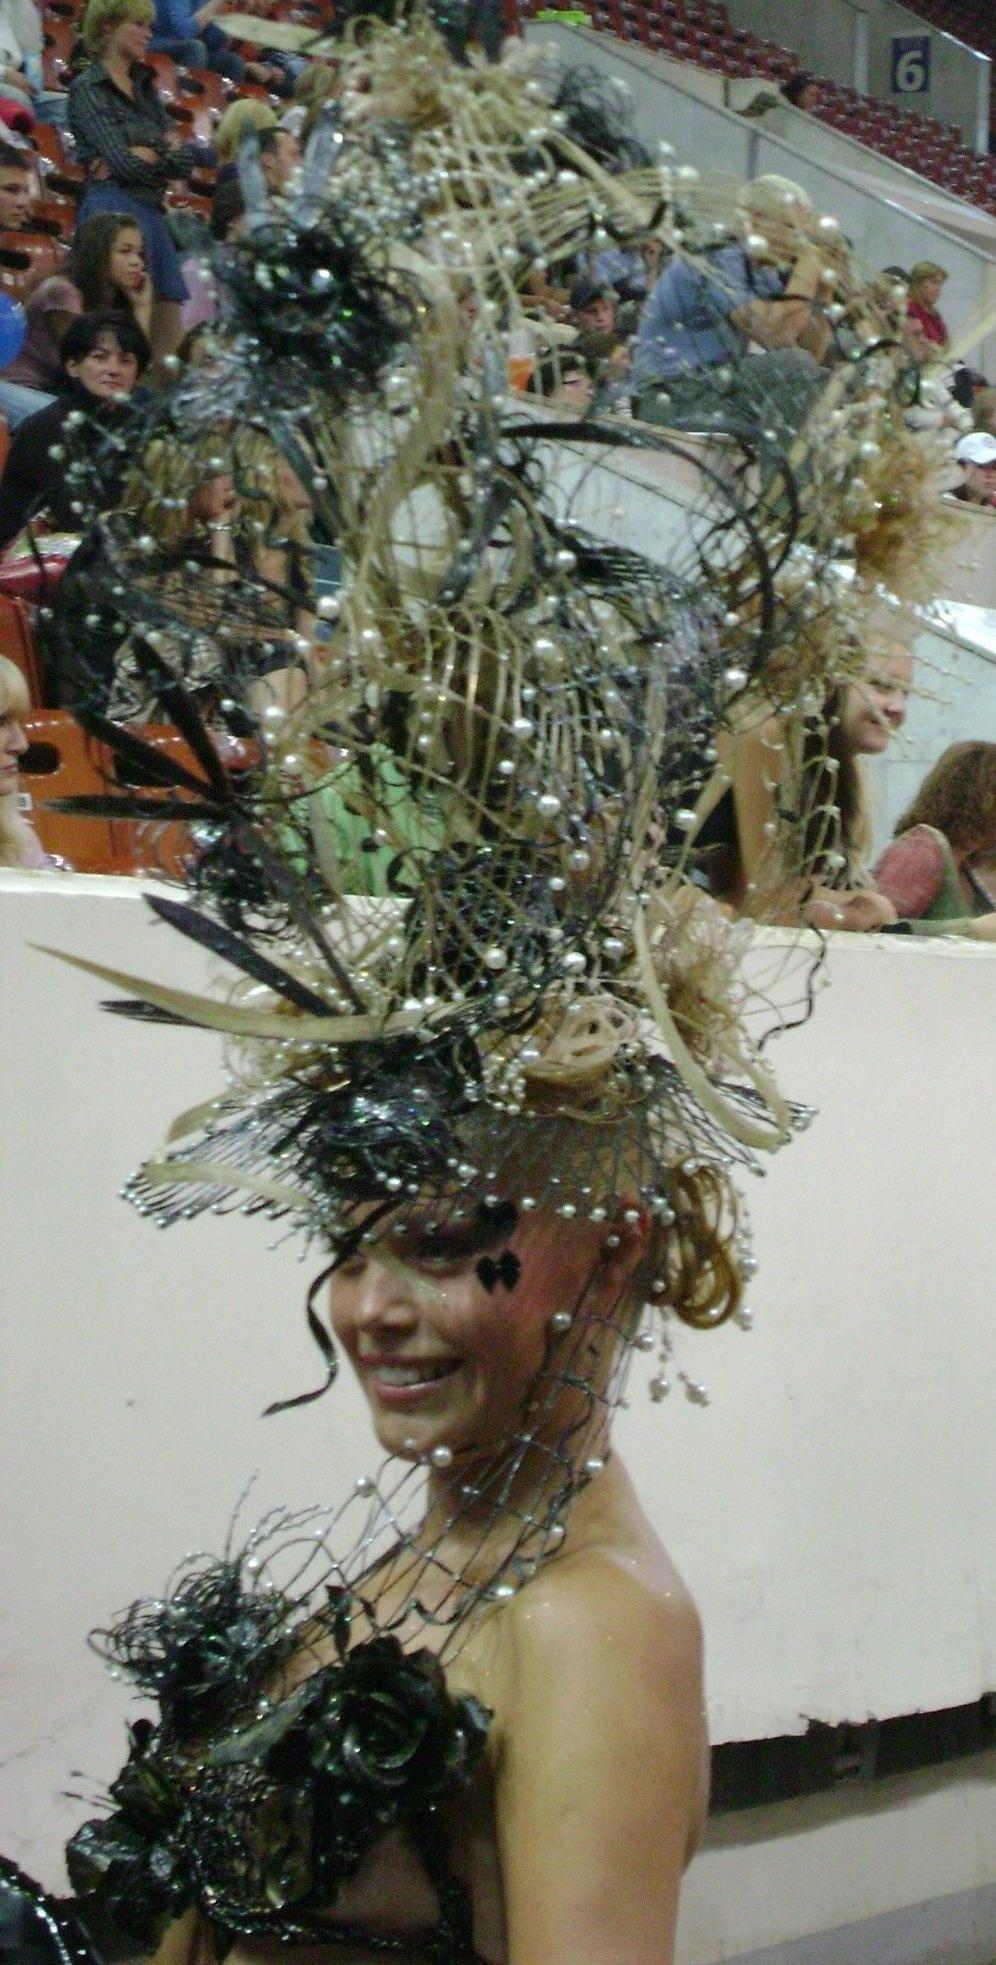 хаир пластика-профессиональная забава и мастерство